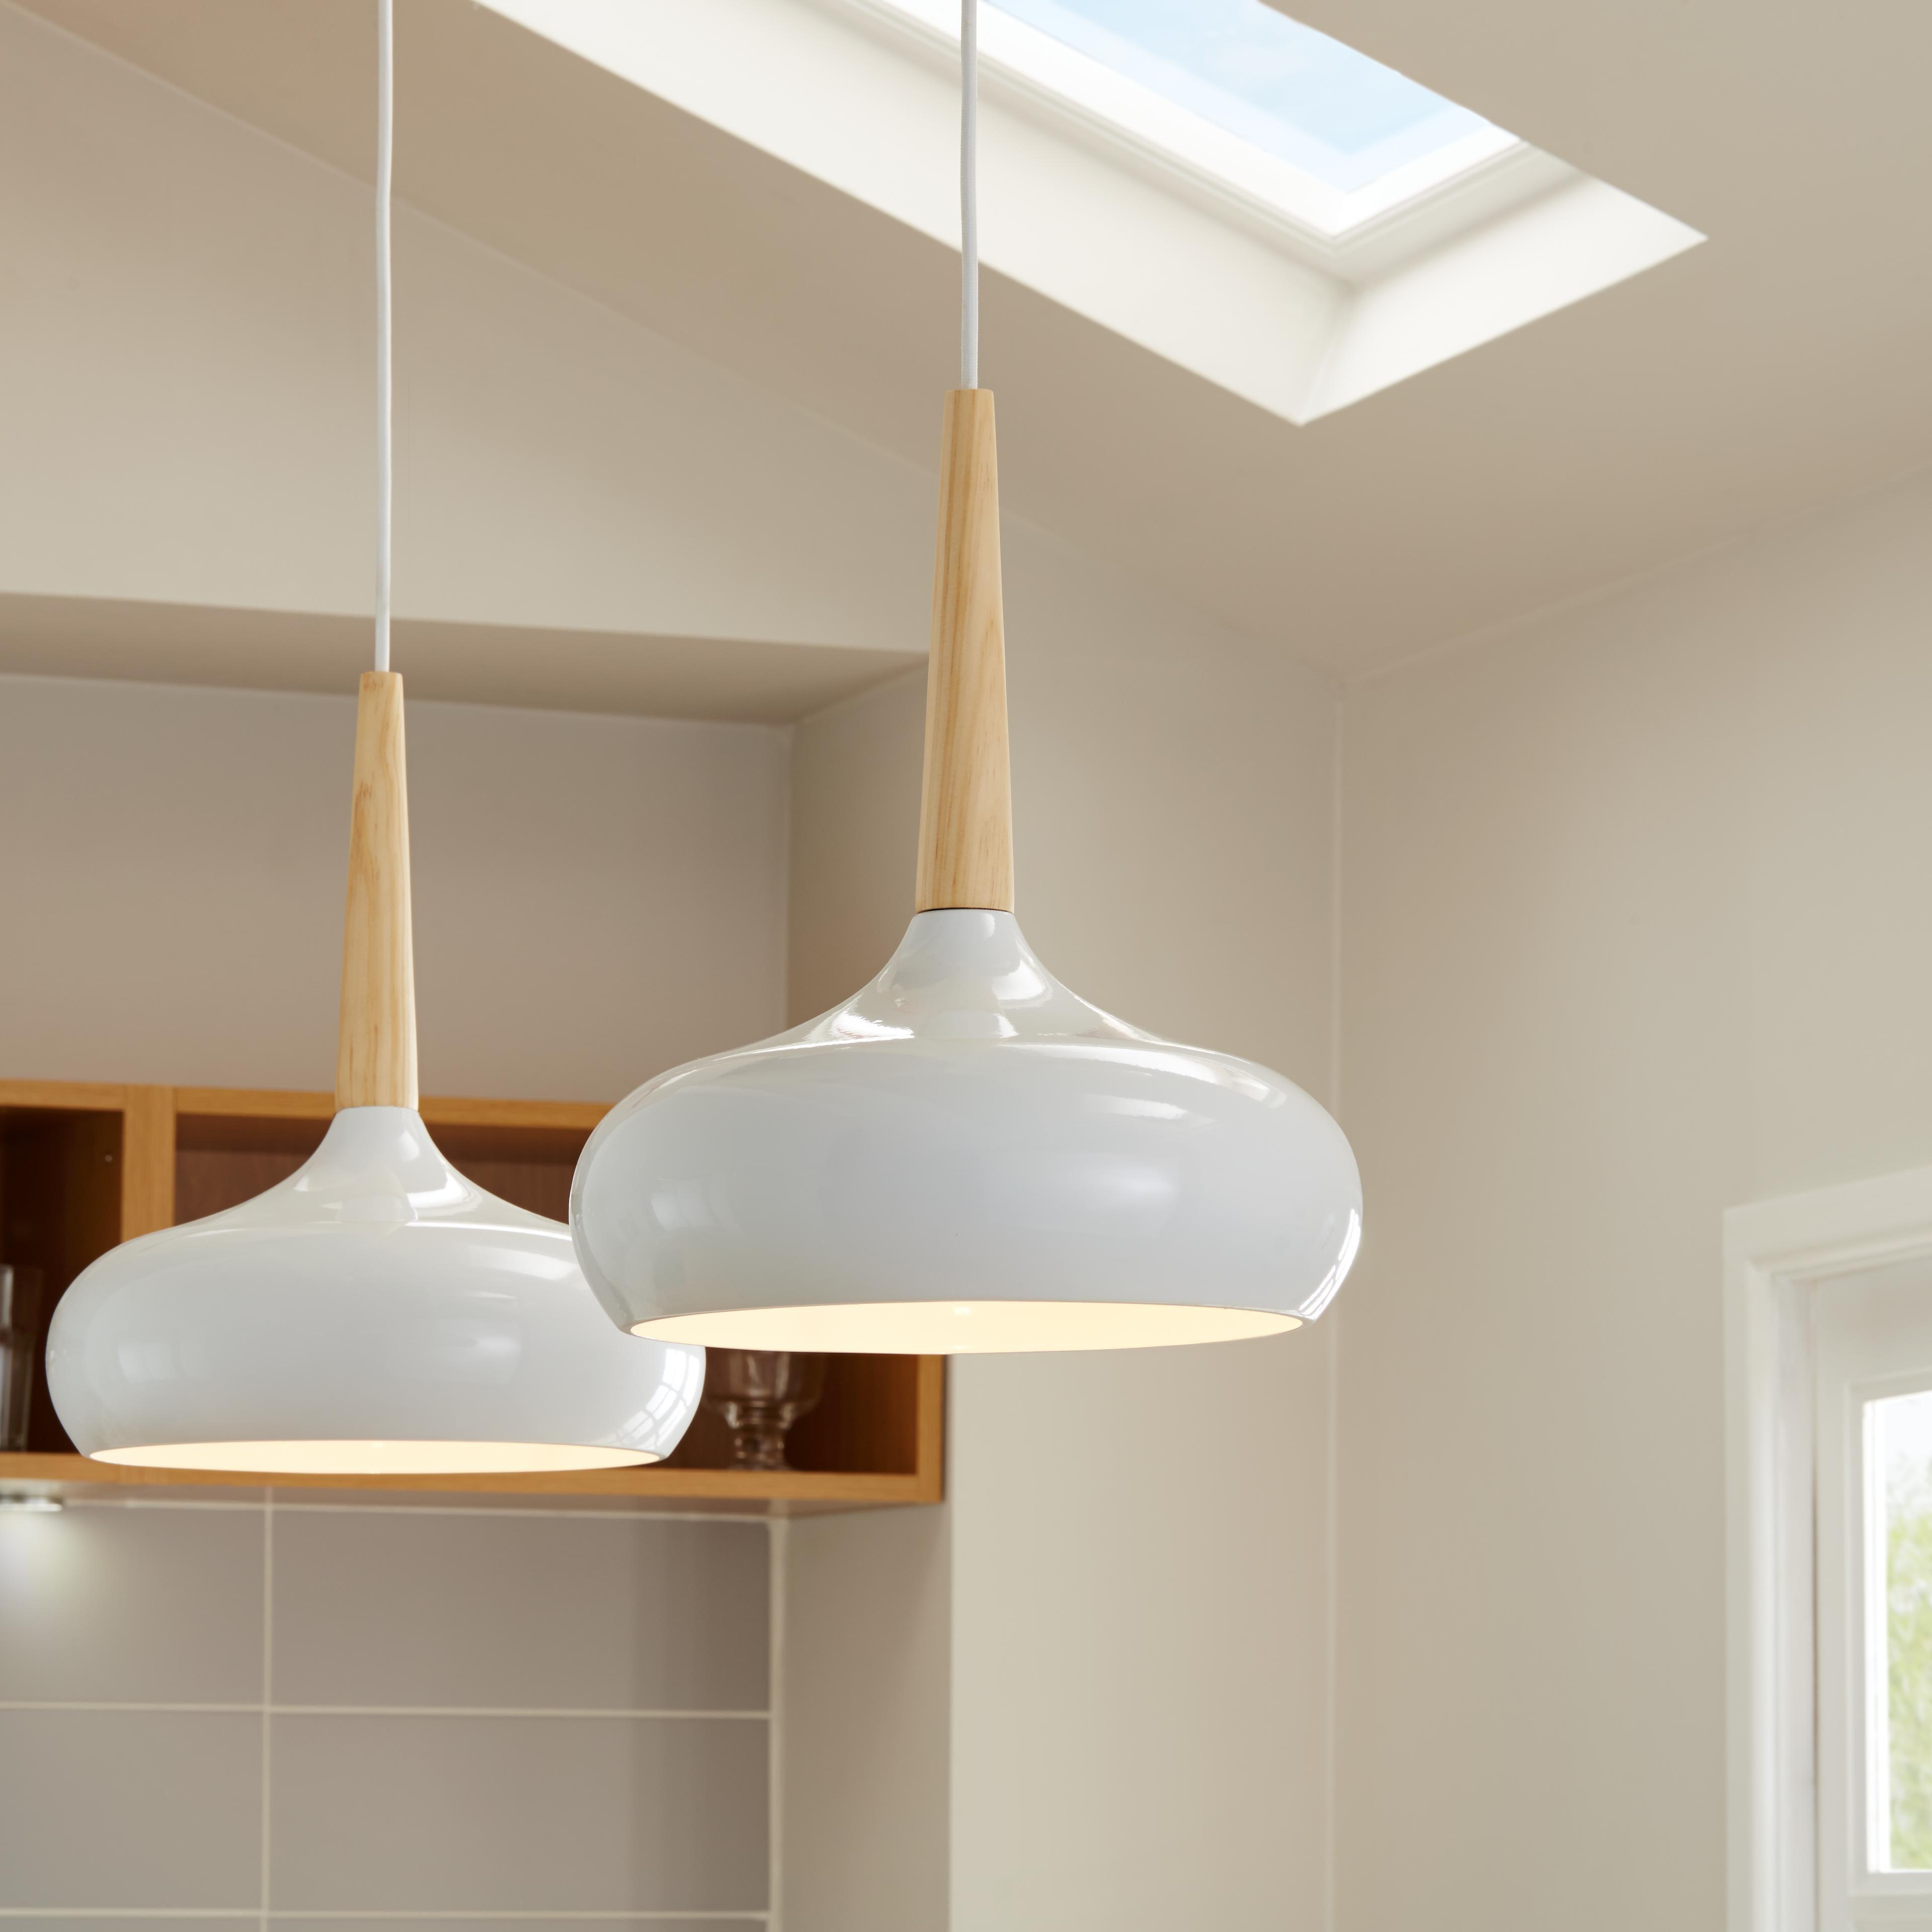 kitchen lights kitchen ceiling lights spotlights rh diy com Flush Kitchen Light Fixtures Kitchen Sink Light Fixtures